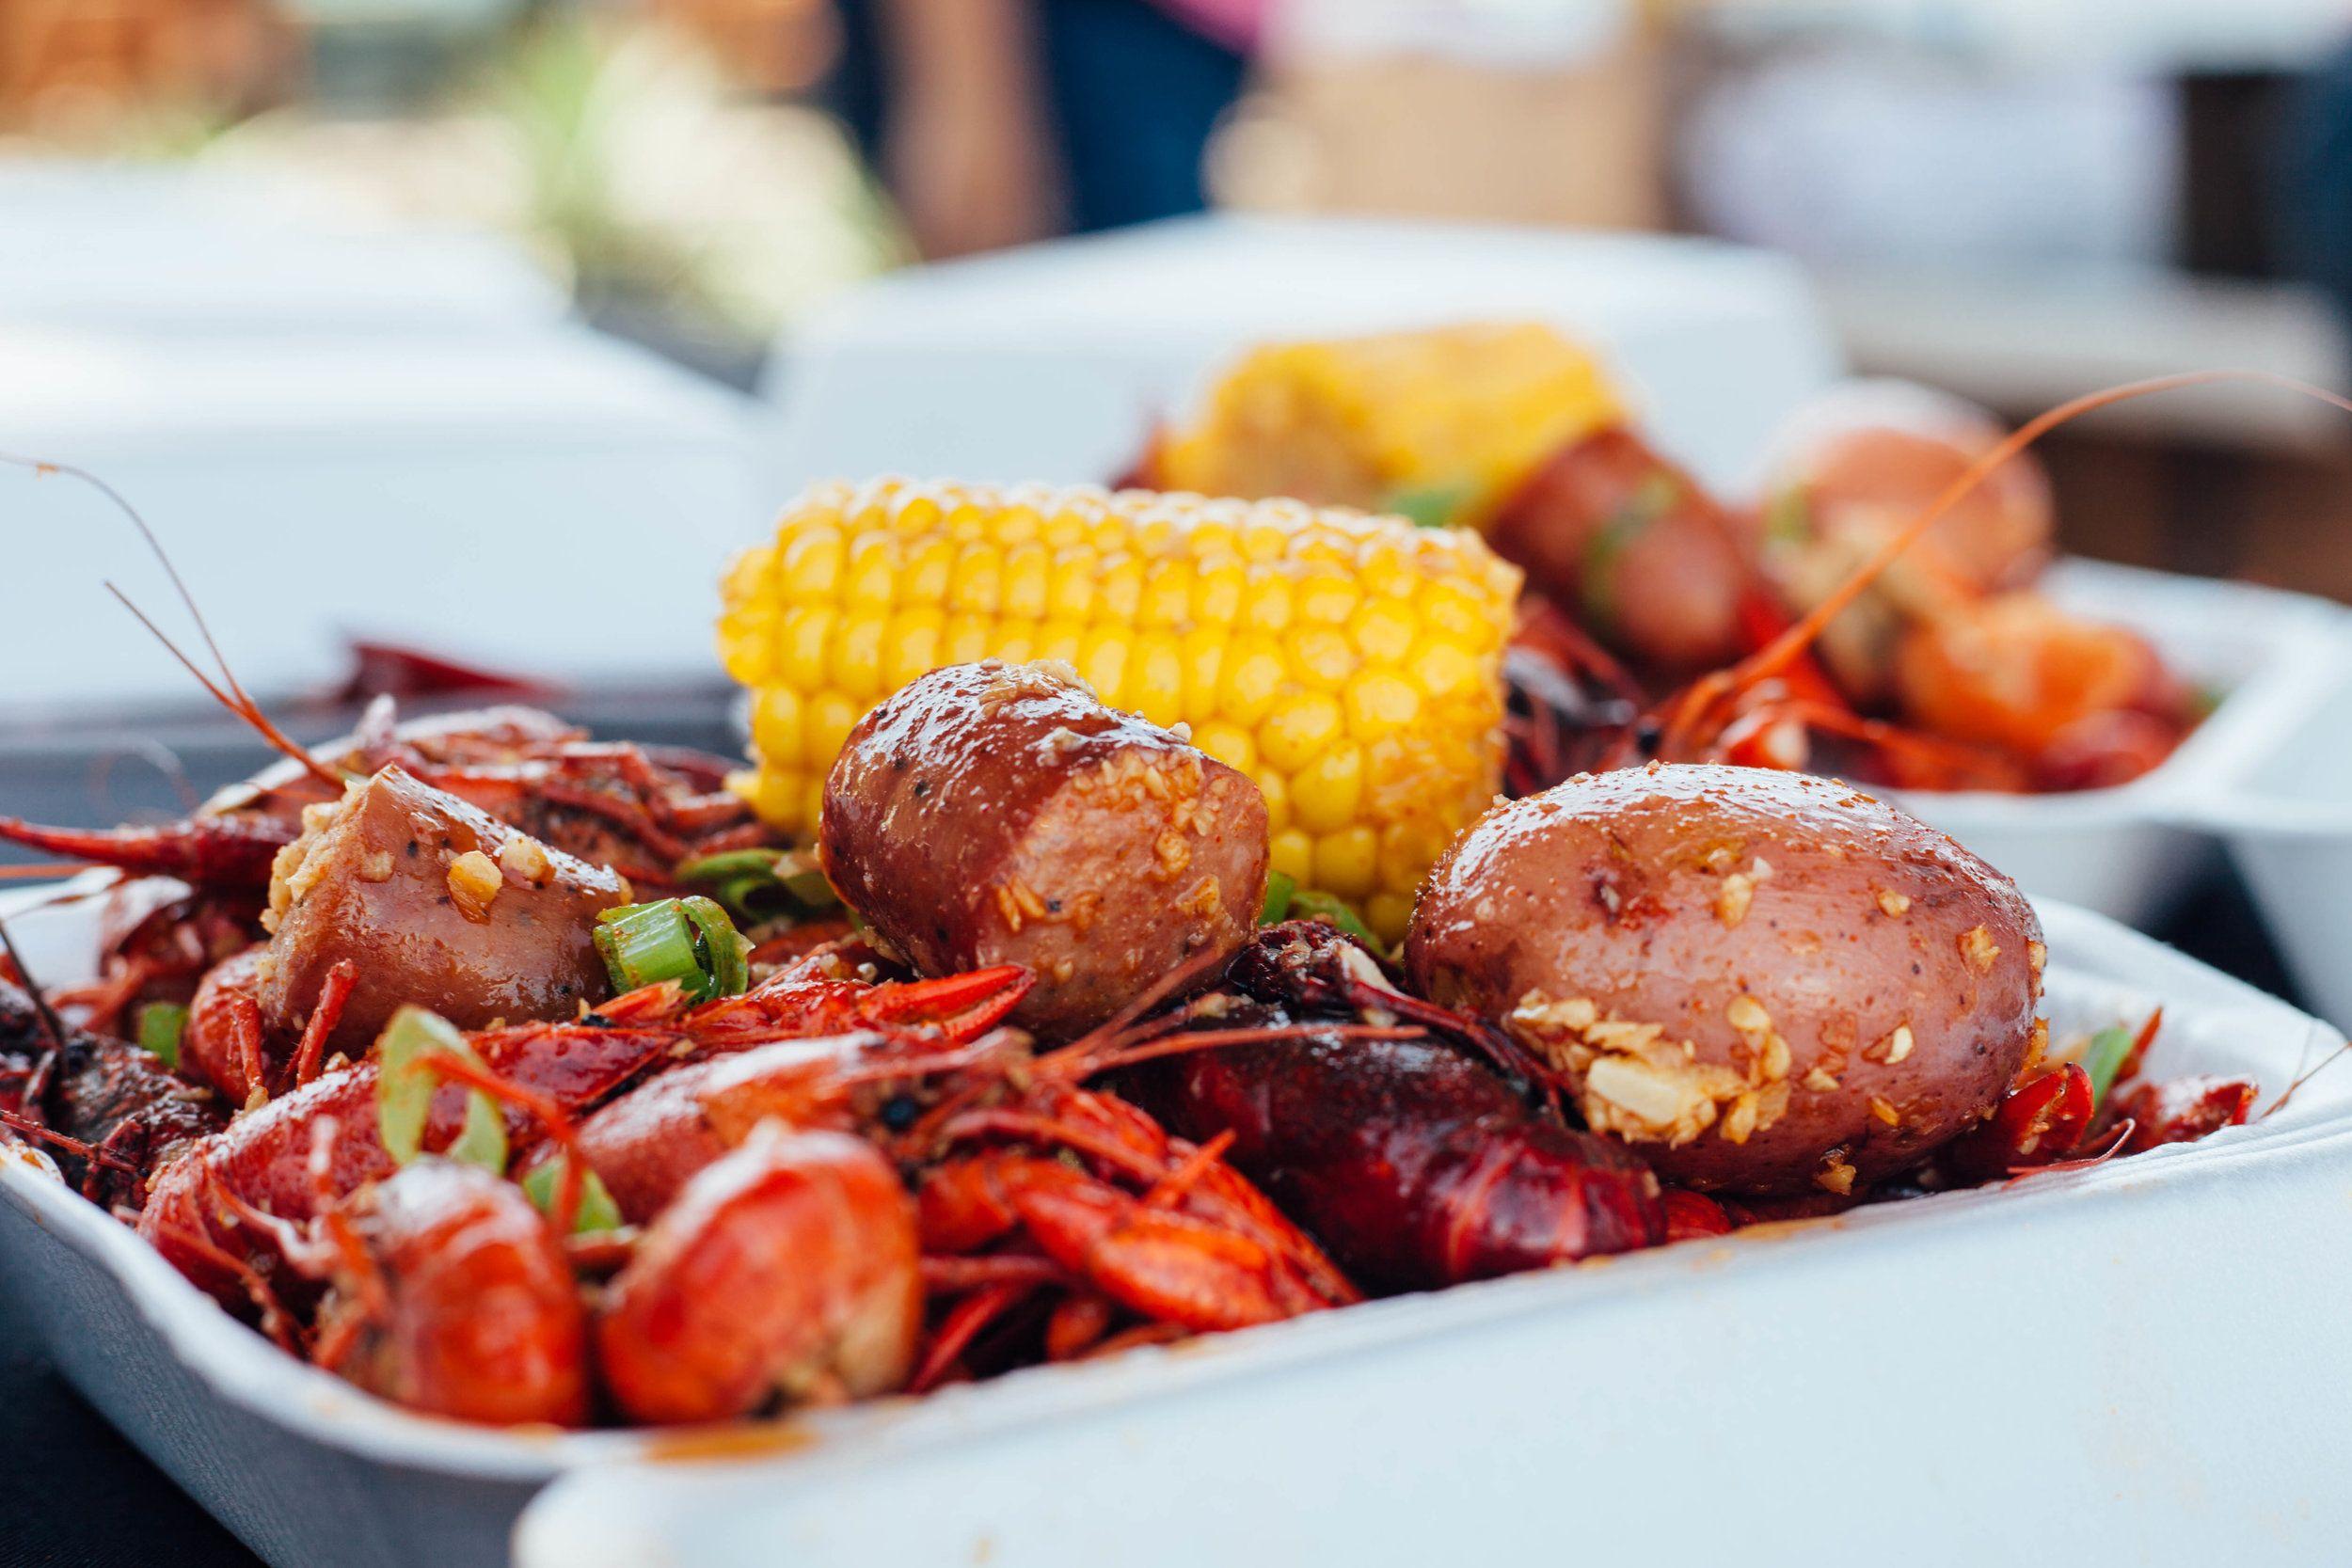 San Antonio Pinch Boil House And Bia Bar Asian Street Food Street Food Food